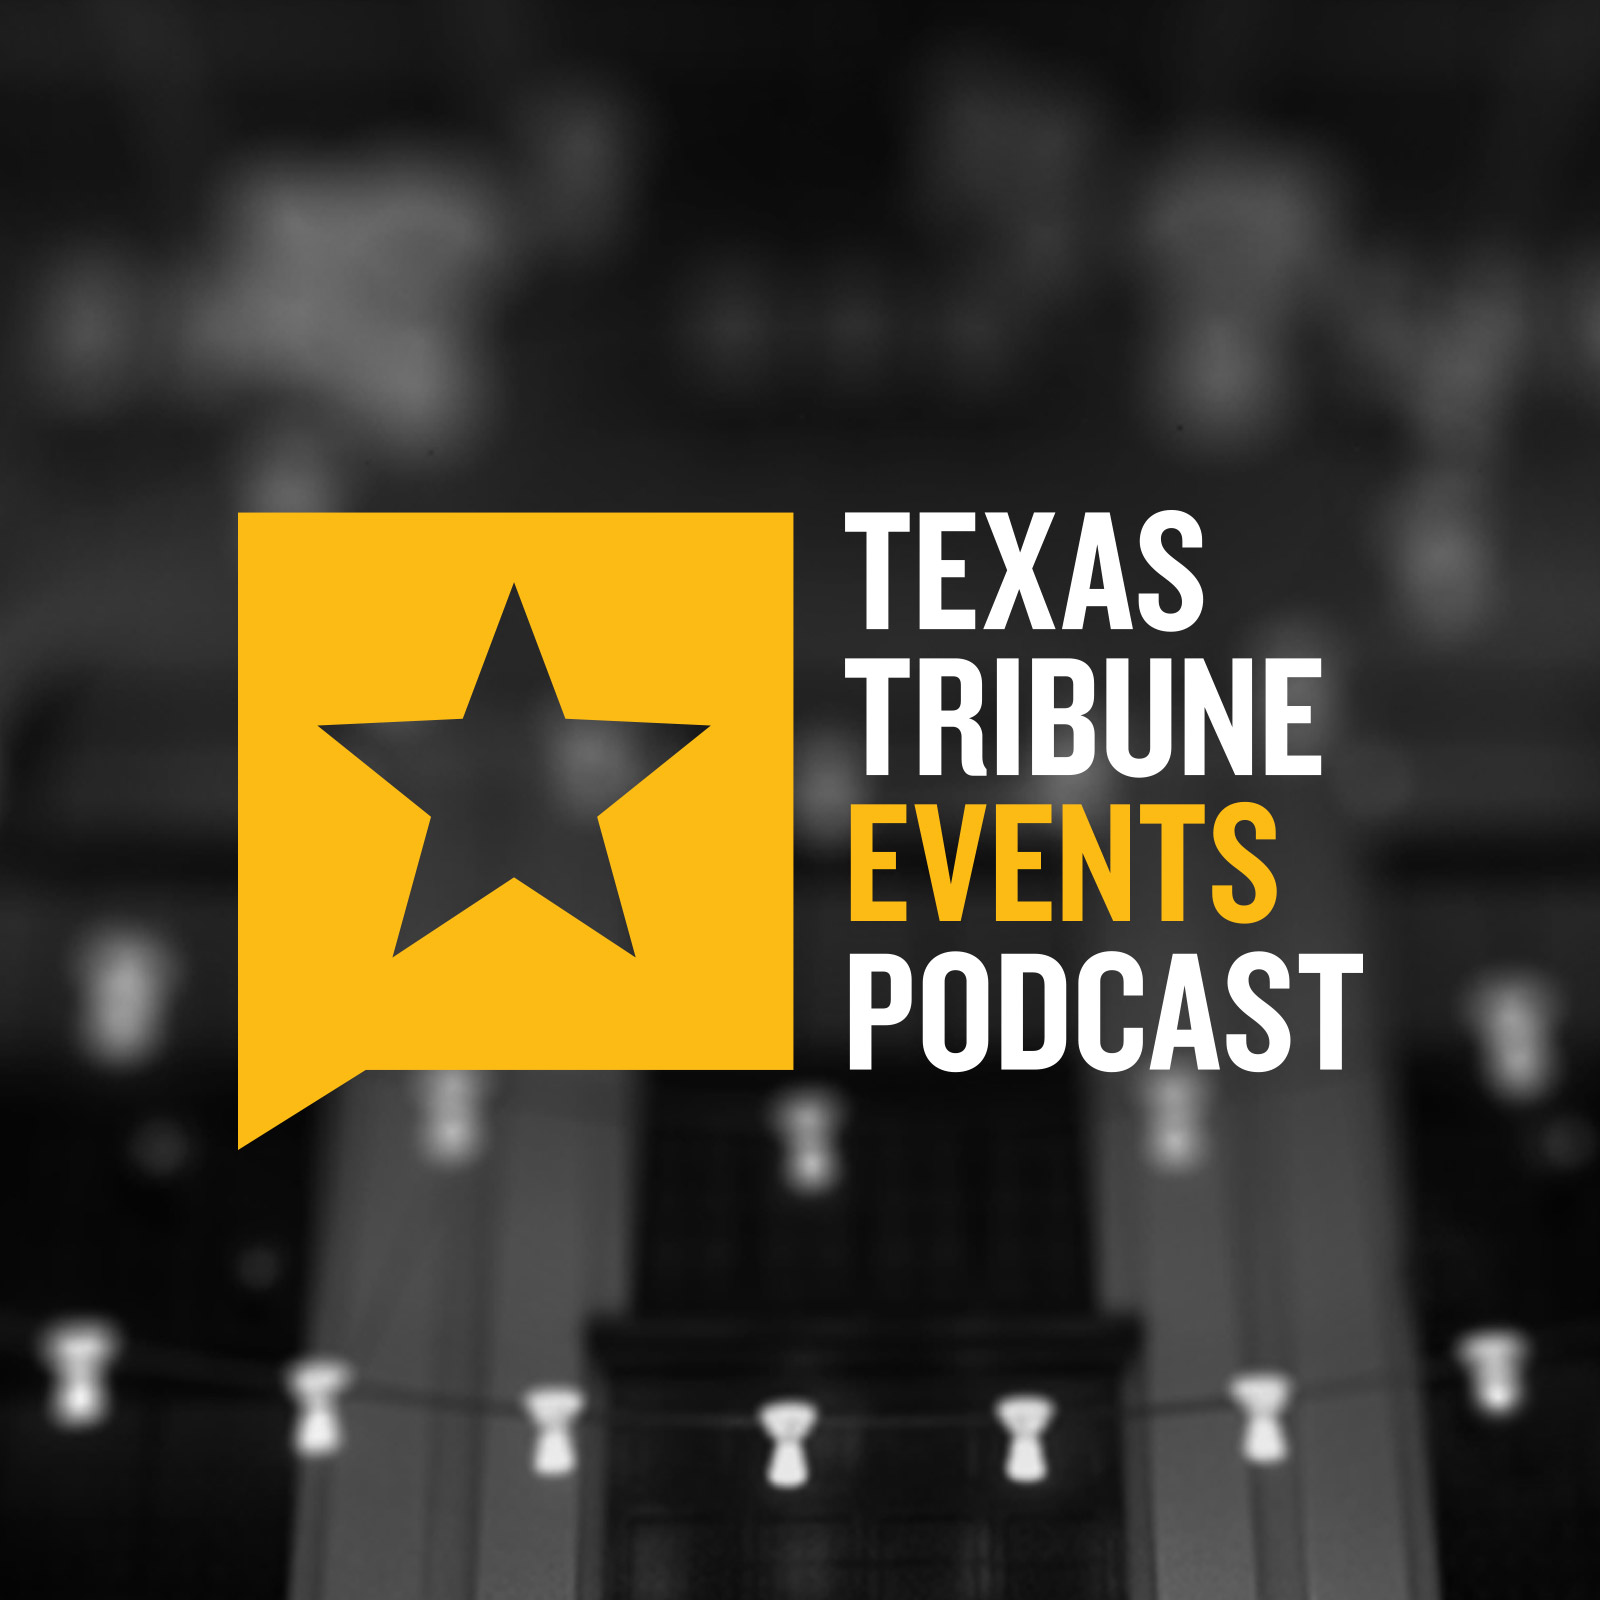 <![CDATA[The Texas Tribune Events Podcast]]>